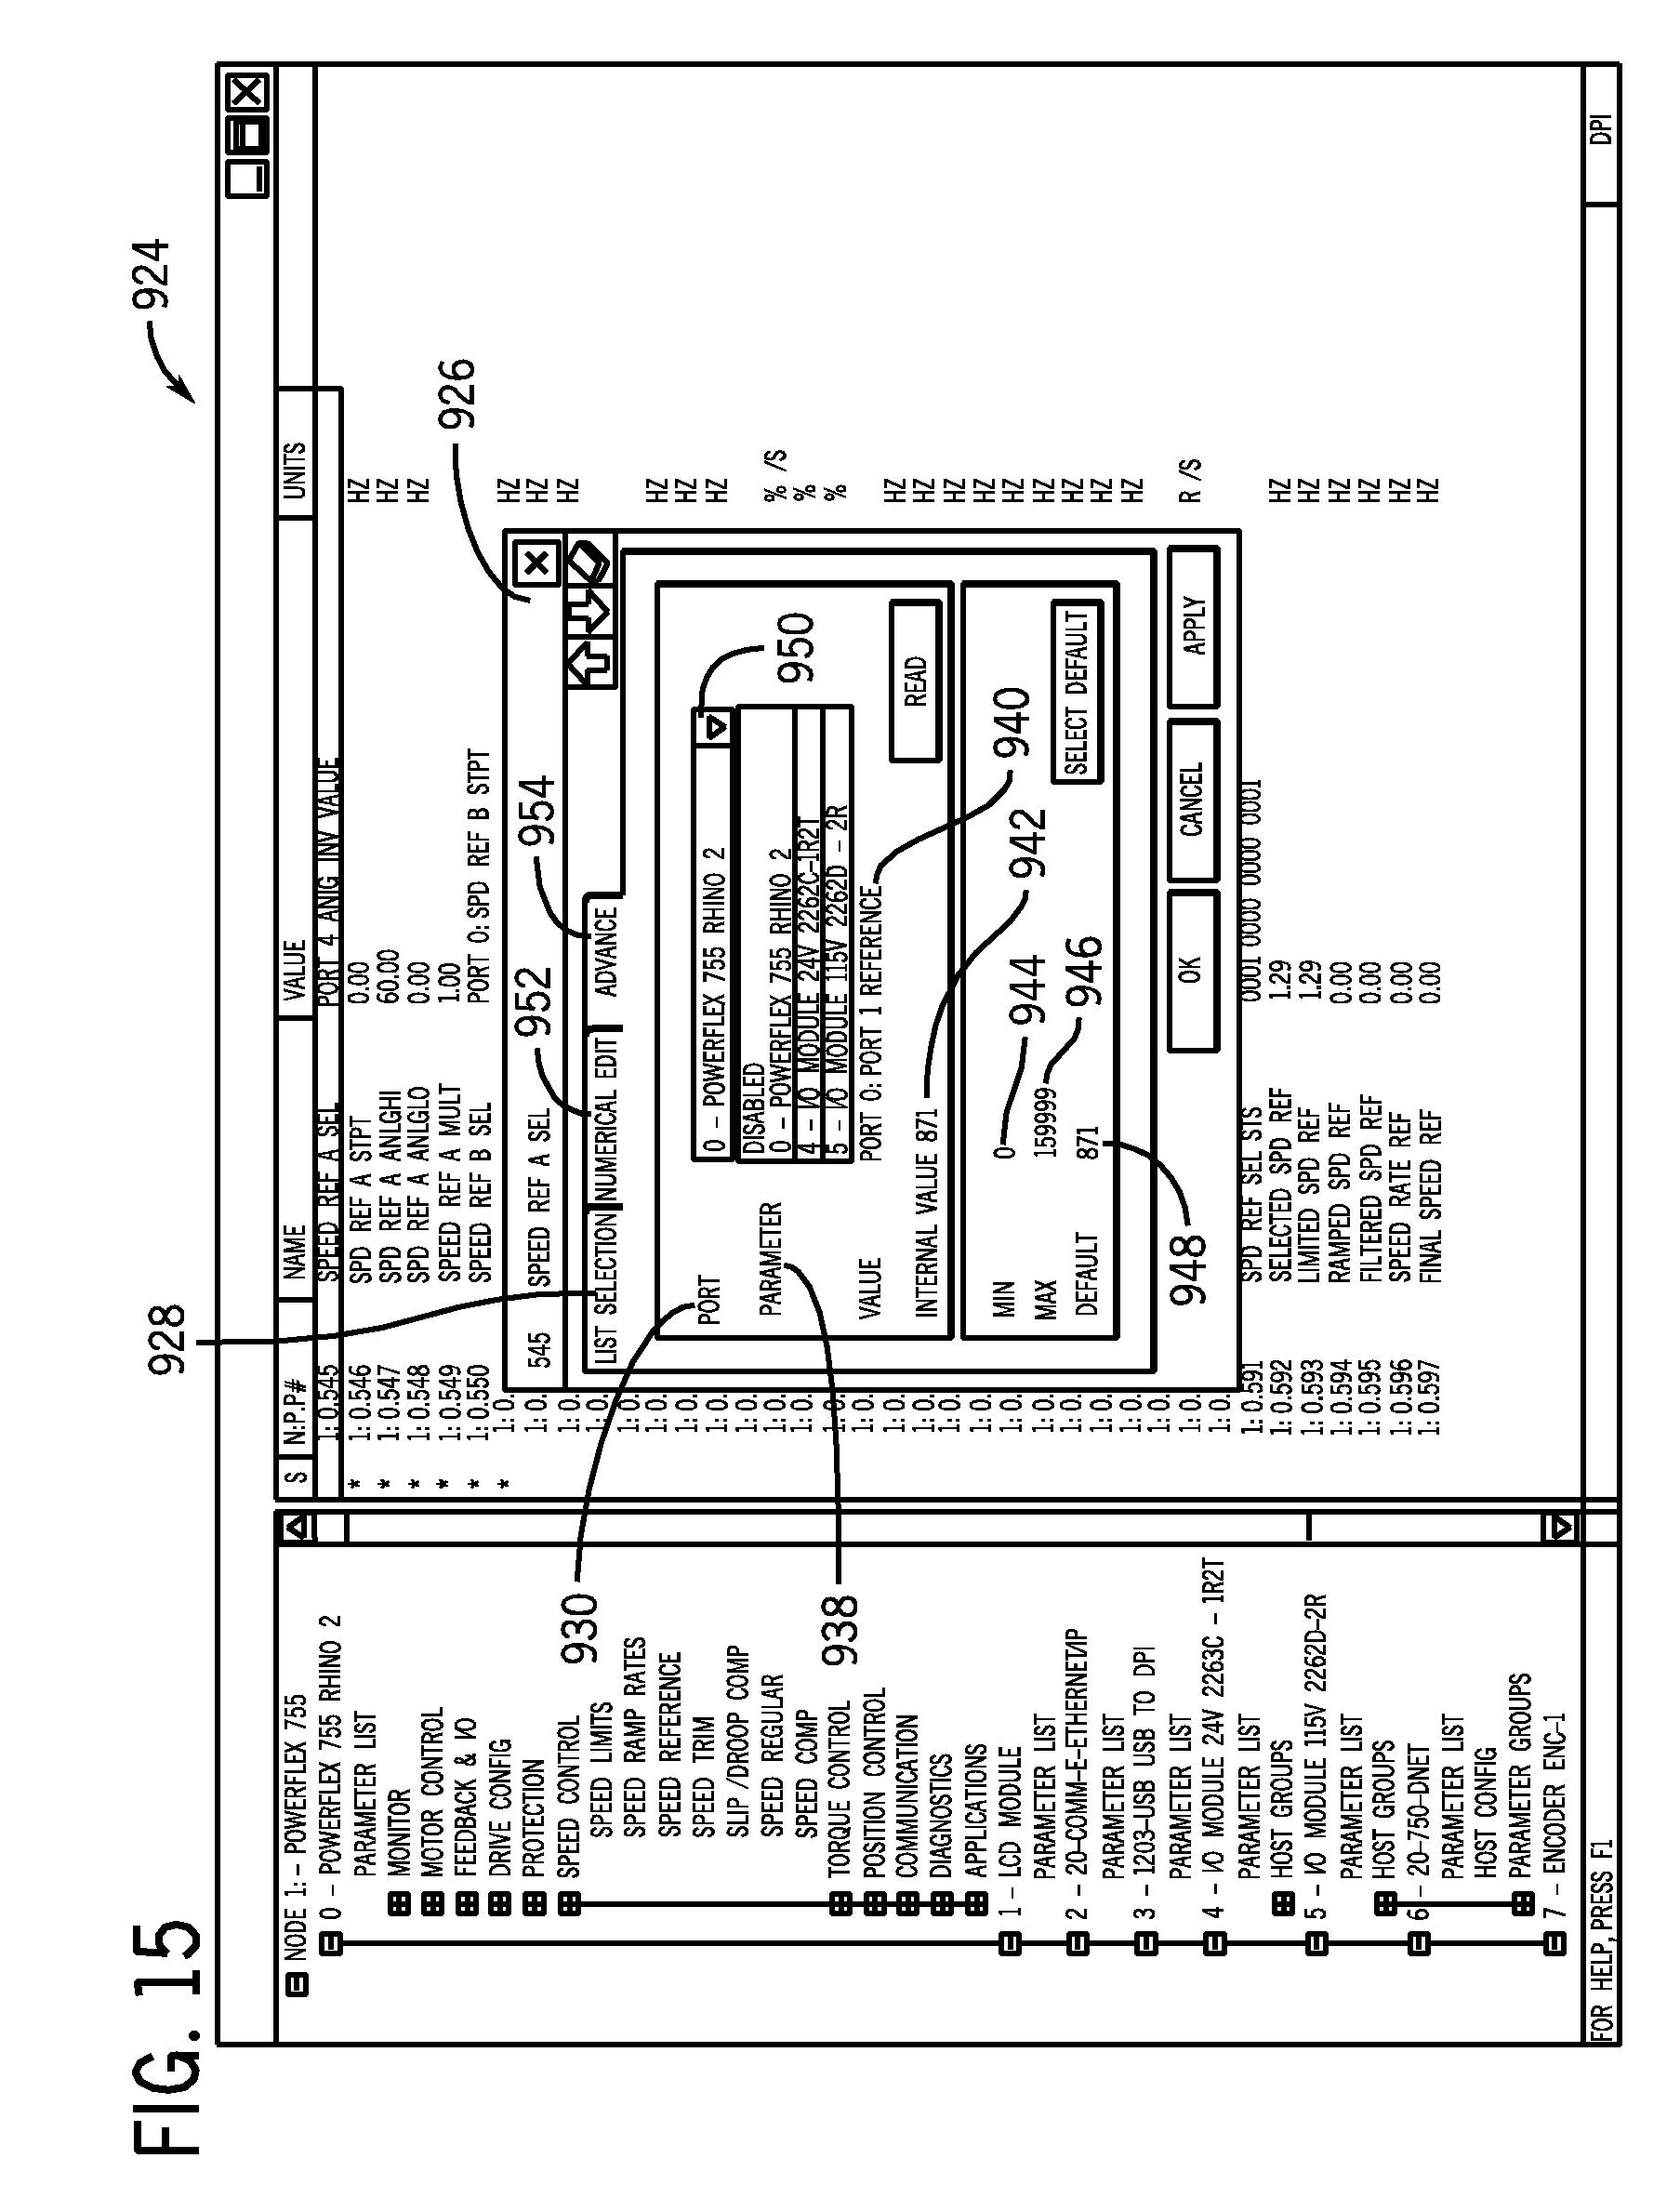 Powerflex 750 Wiring Diagram